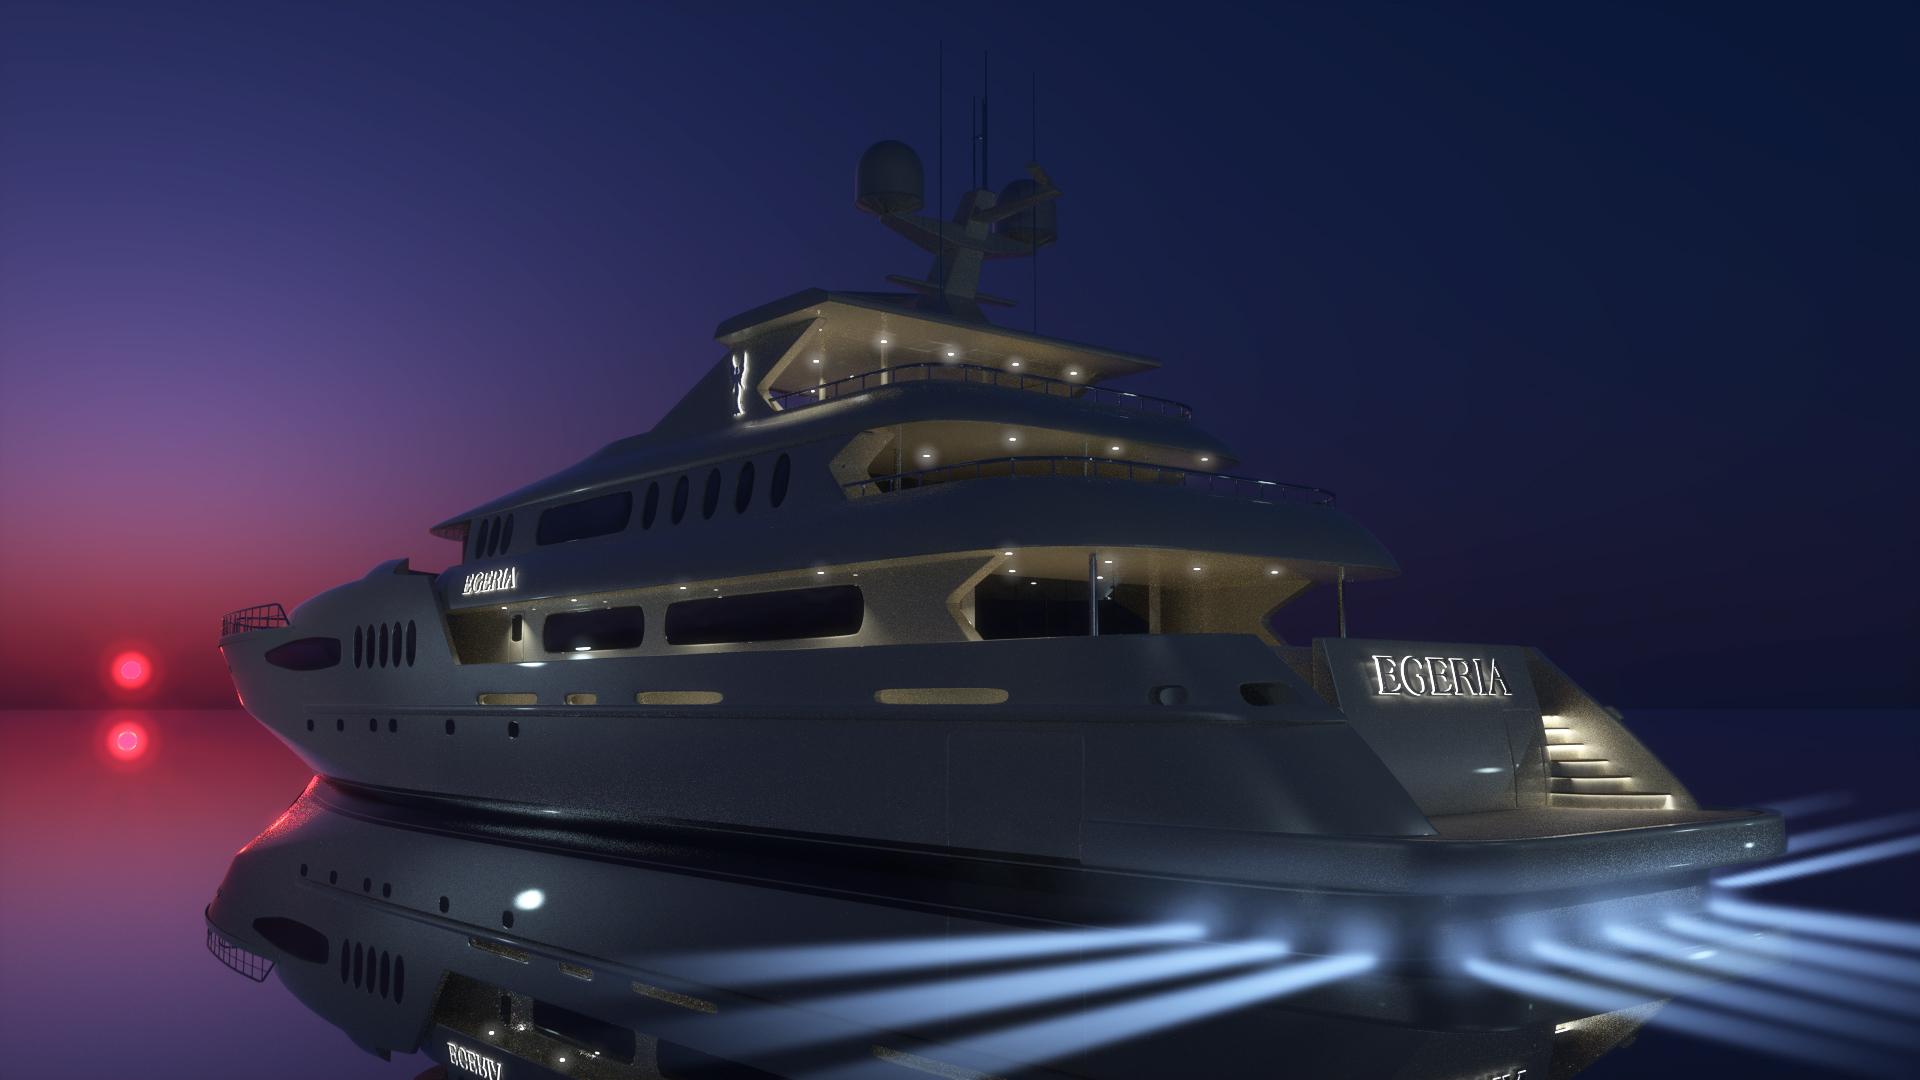 Wallpaper Predator 3d Yacht Lord Of The Seas An Egeria Yachts Superyacht